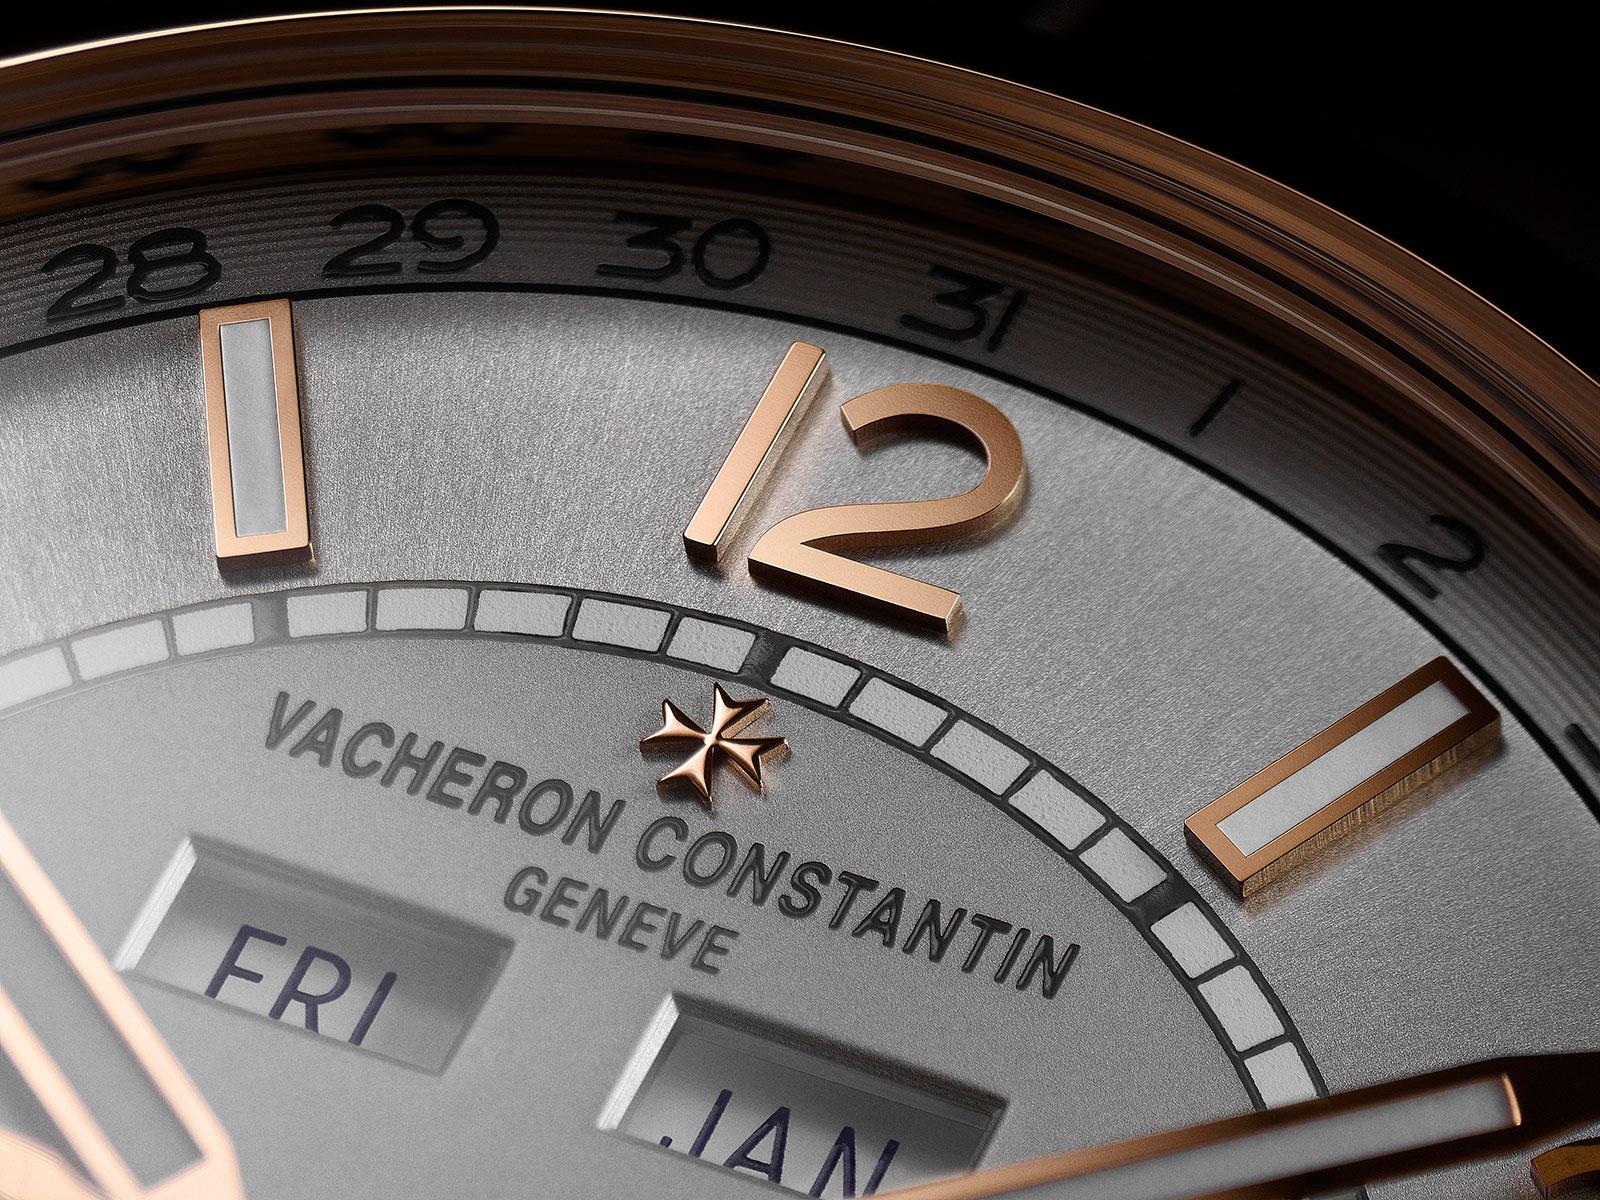 Vacheron Constantin FiftySix sector dial